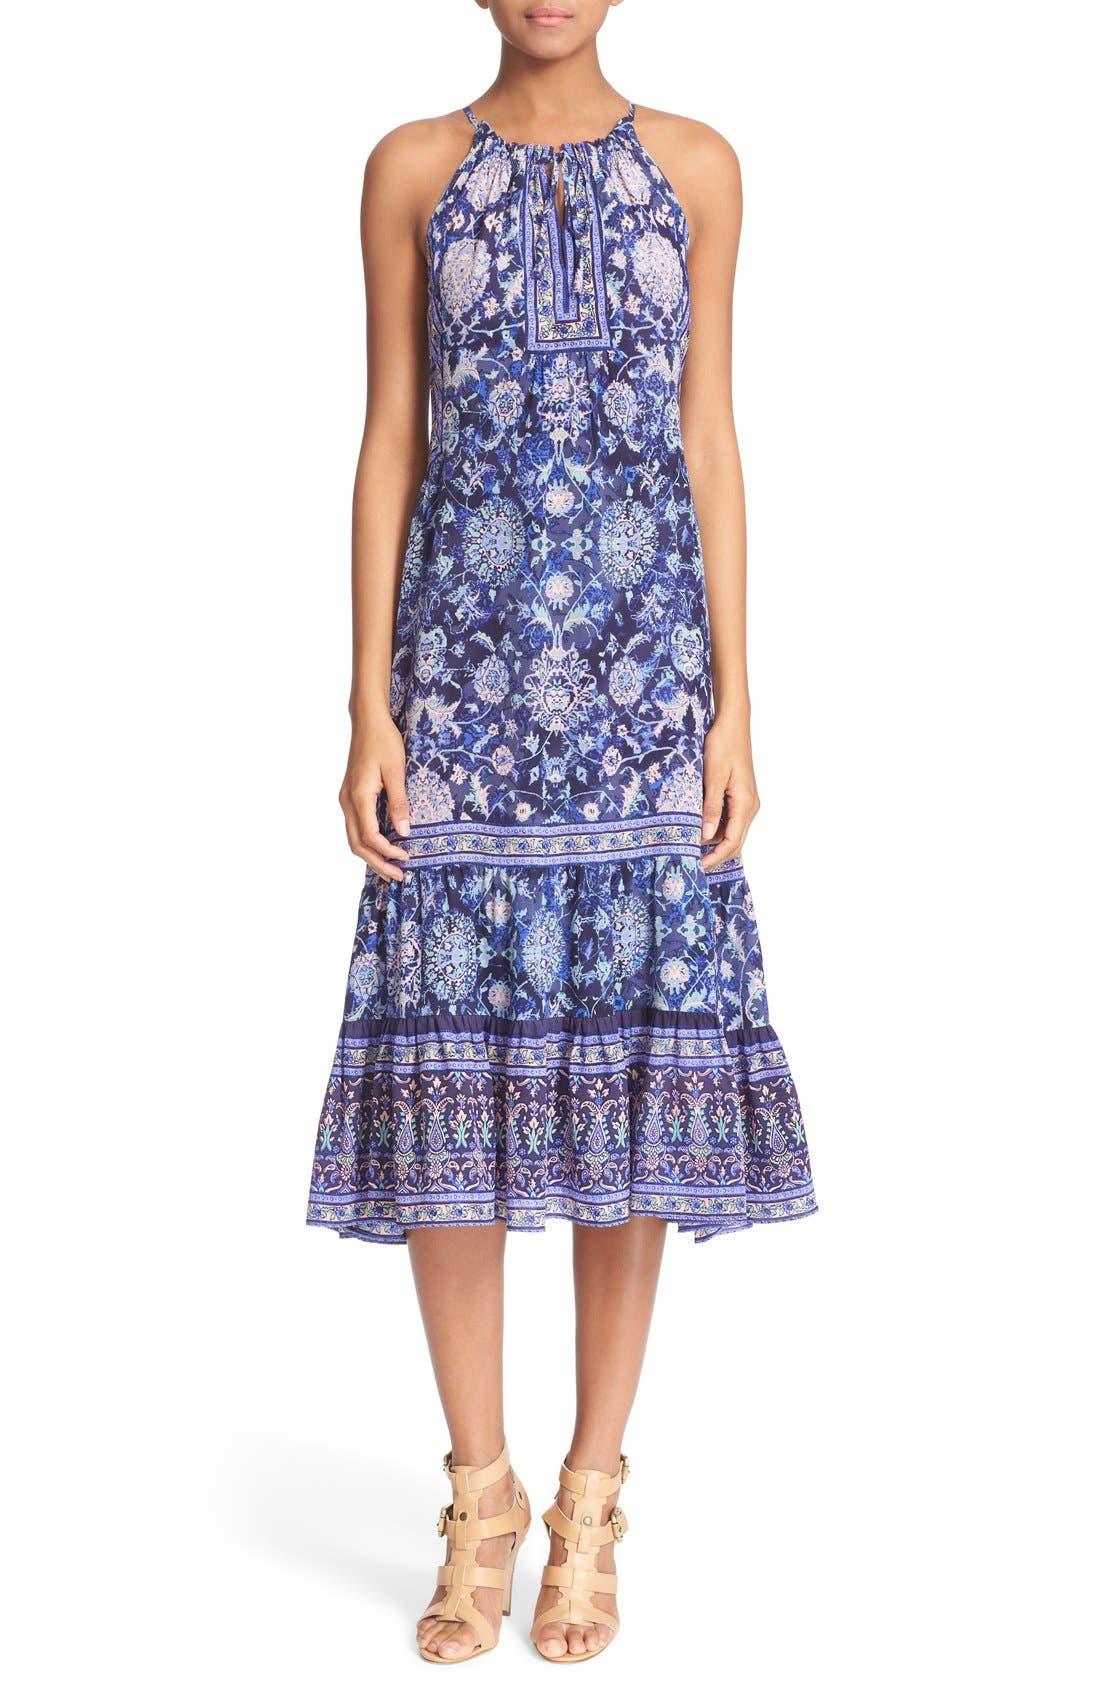 Alternate Image 1 Selected - Rebecca Taylor 'Dreamweaver' Print Silk Midi Dress